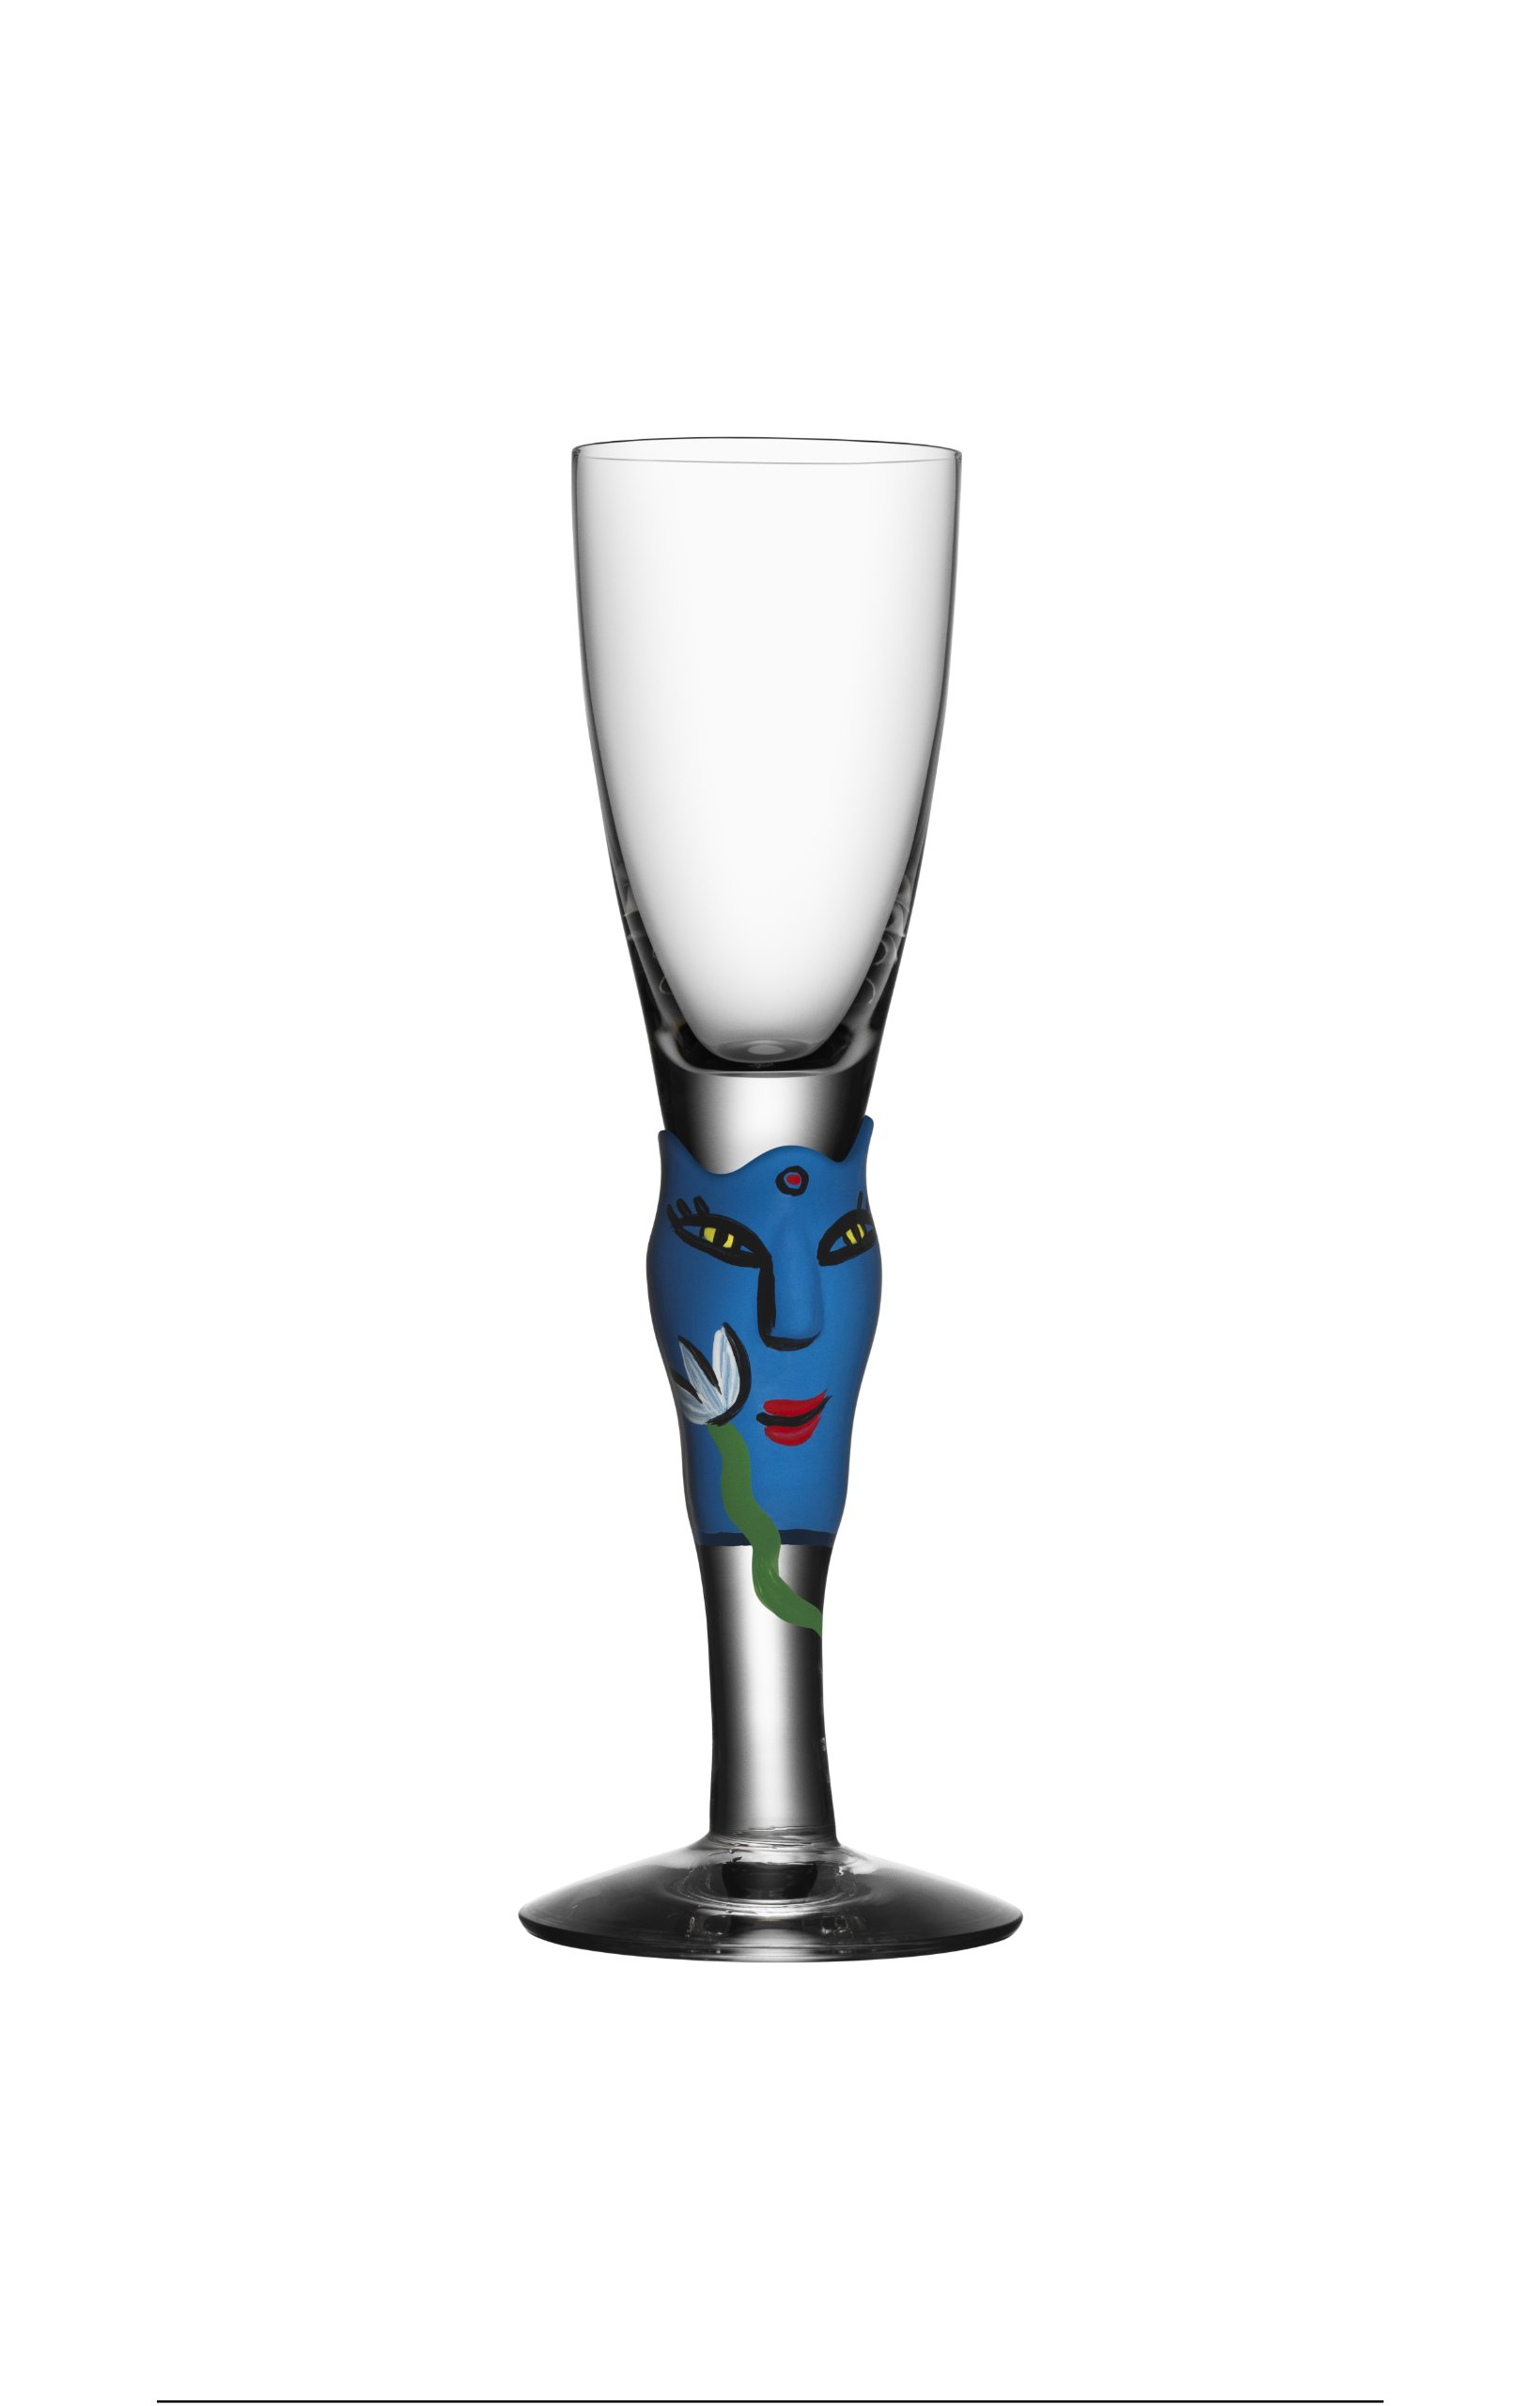 Kosta Boda Open Minds Shot Glass, Blue